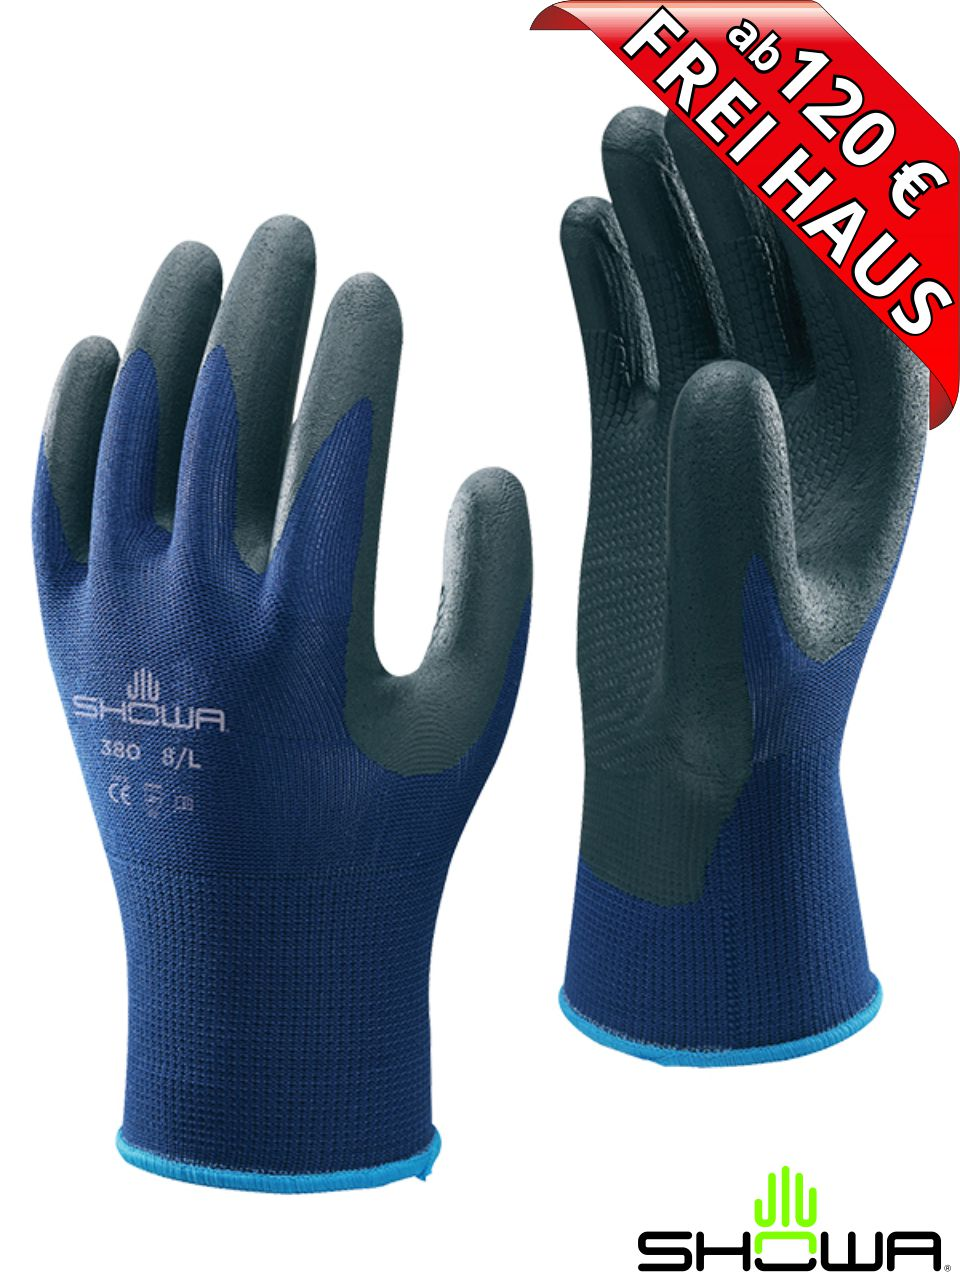 Showa Grip-Handschuhe 310 grün